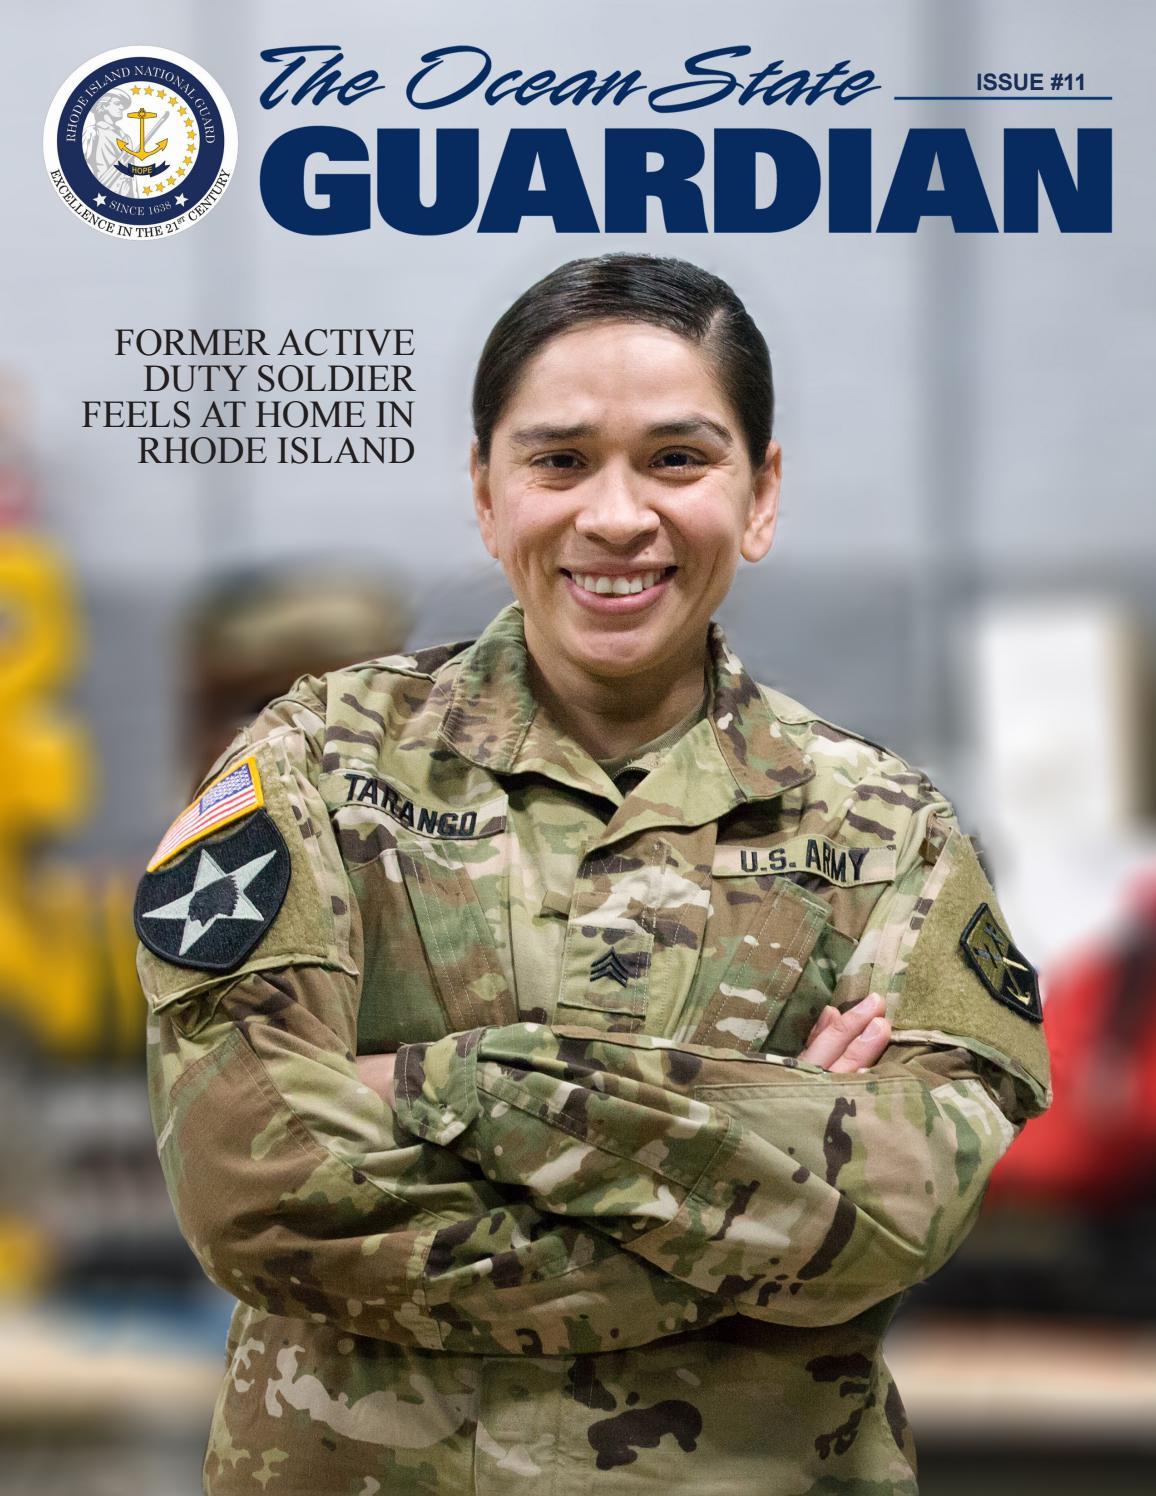 Ocean State Guardian Online Issue 11 By Rhode Island